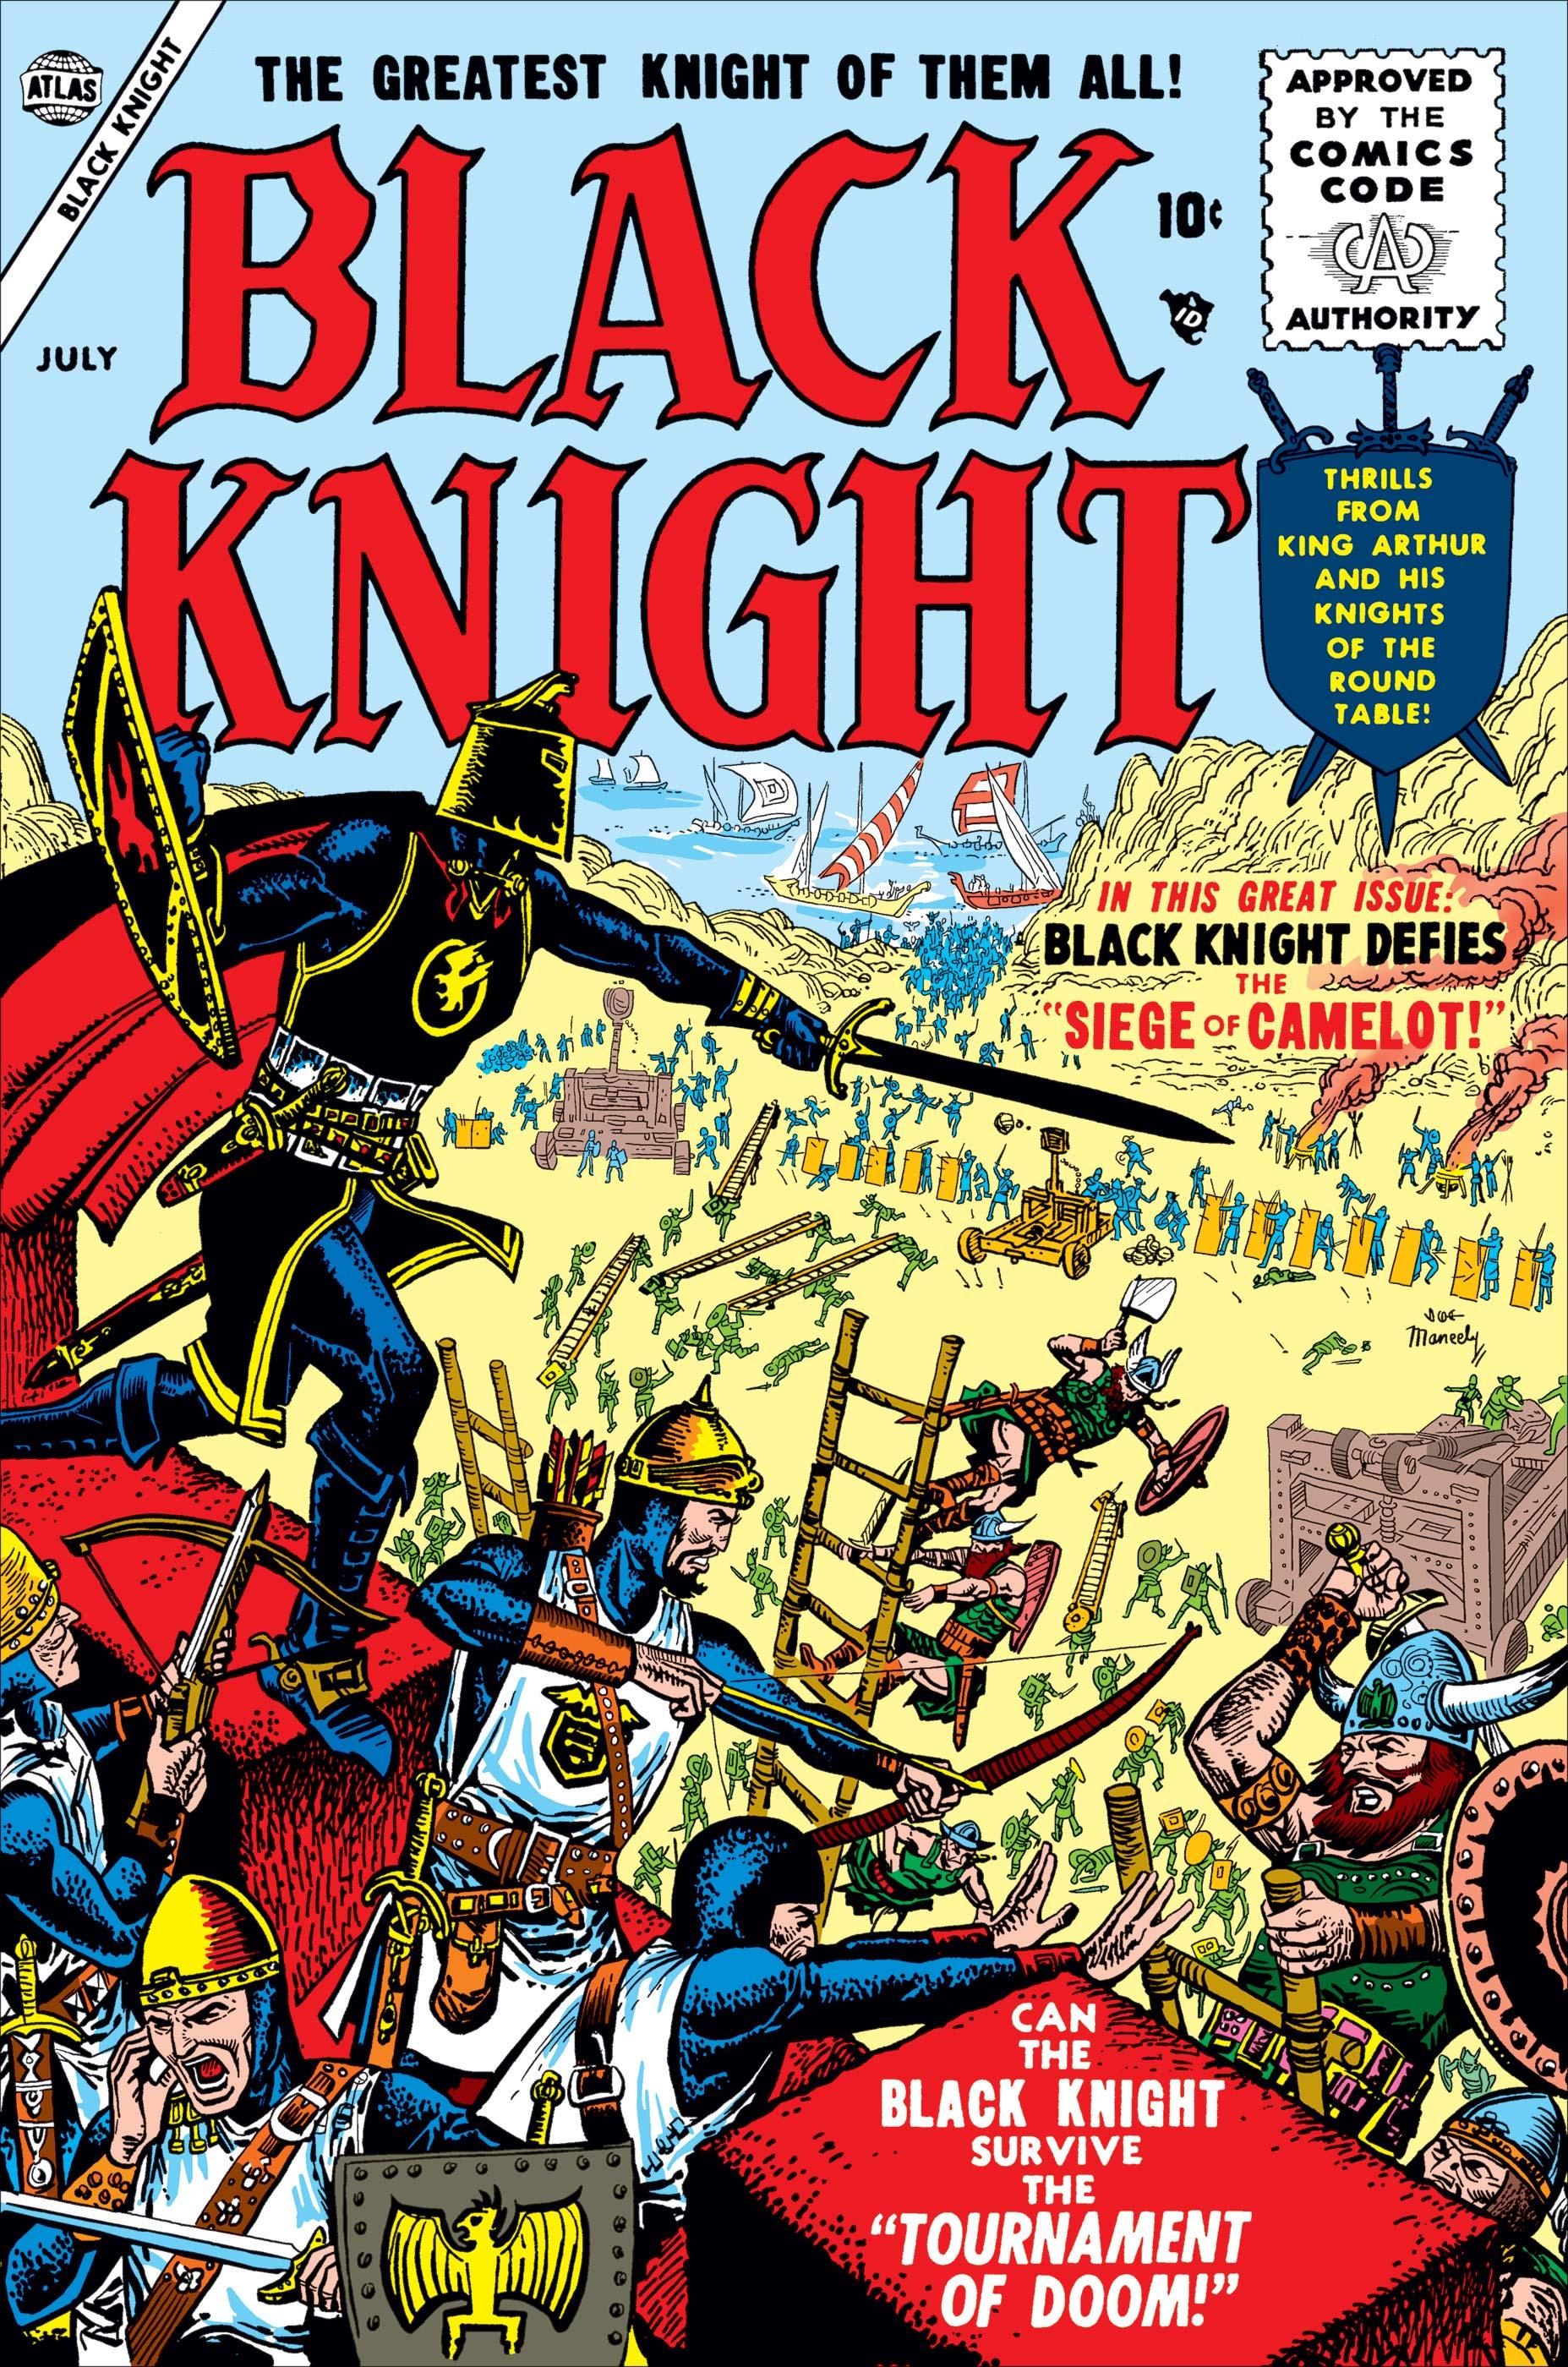 Black Knight (1955) #2